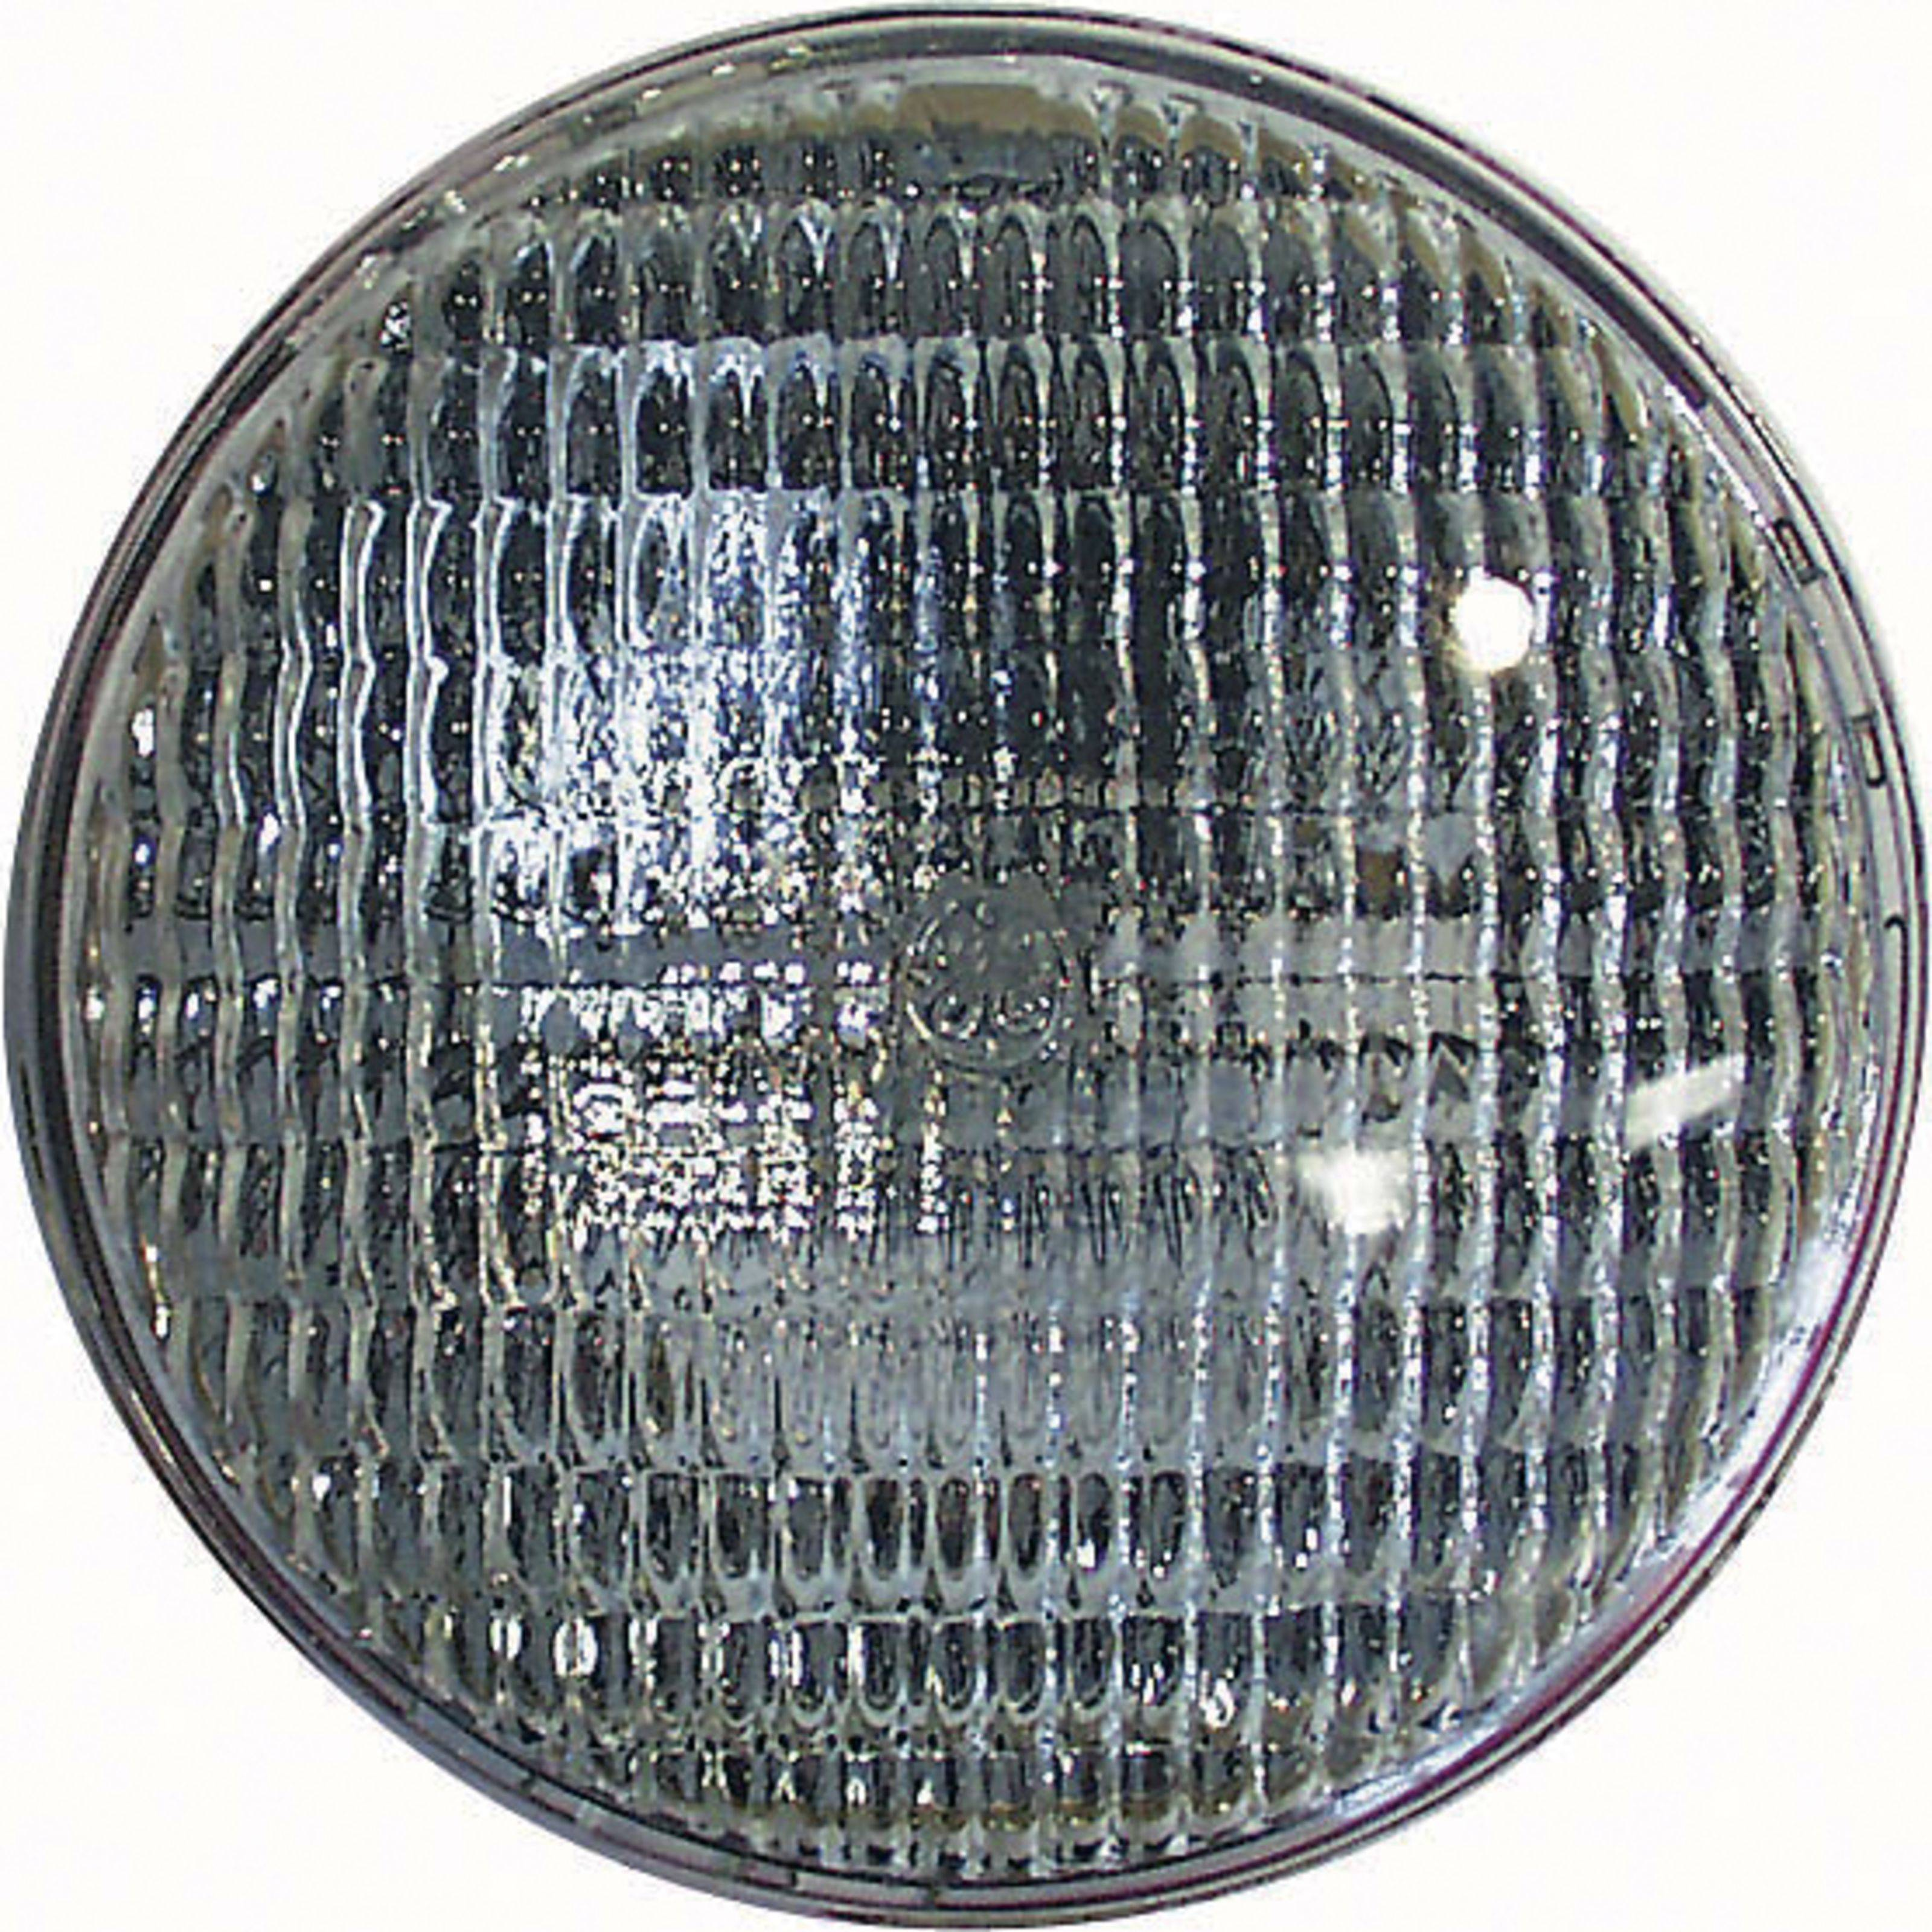 GE Lighting Bulb Par 56 300W WFL GE